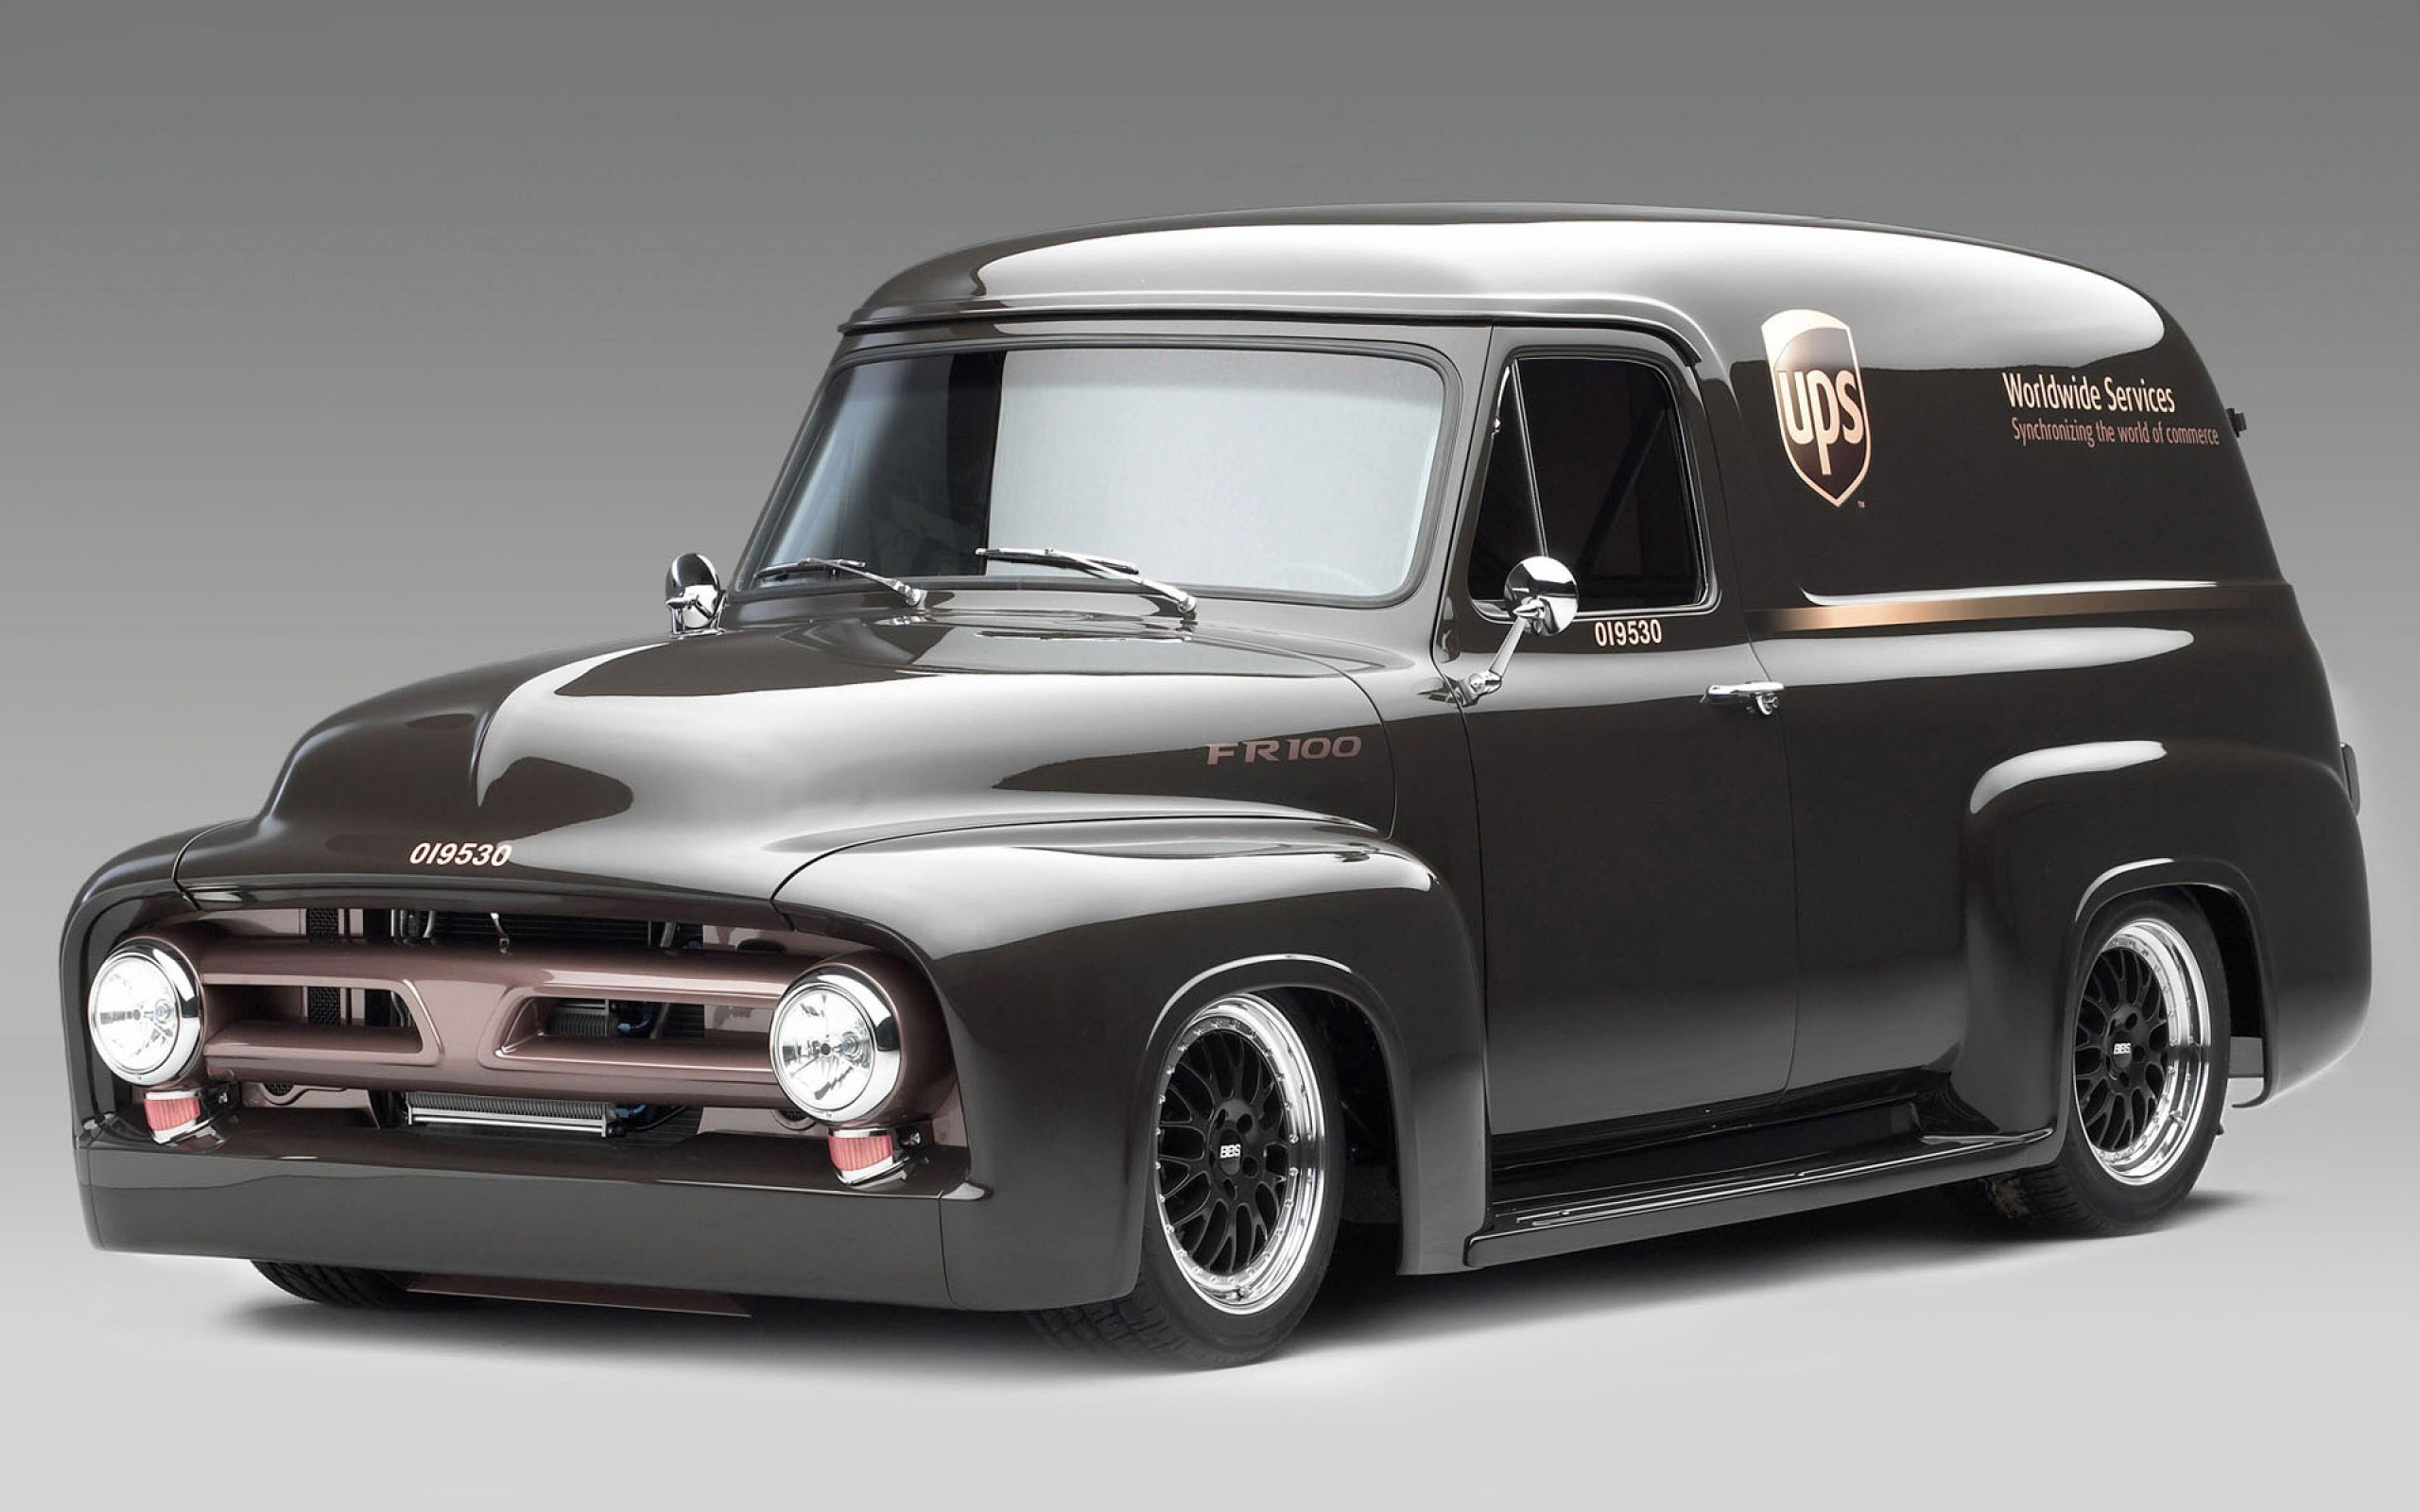 Ford panel truck fr100 stationwagon van retro hot rods rod retro classic h wallpaper 2560x1600